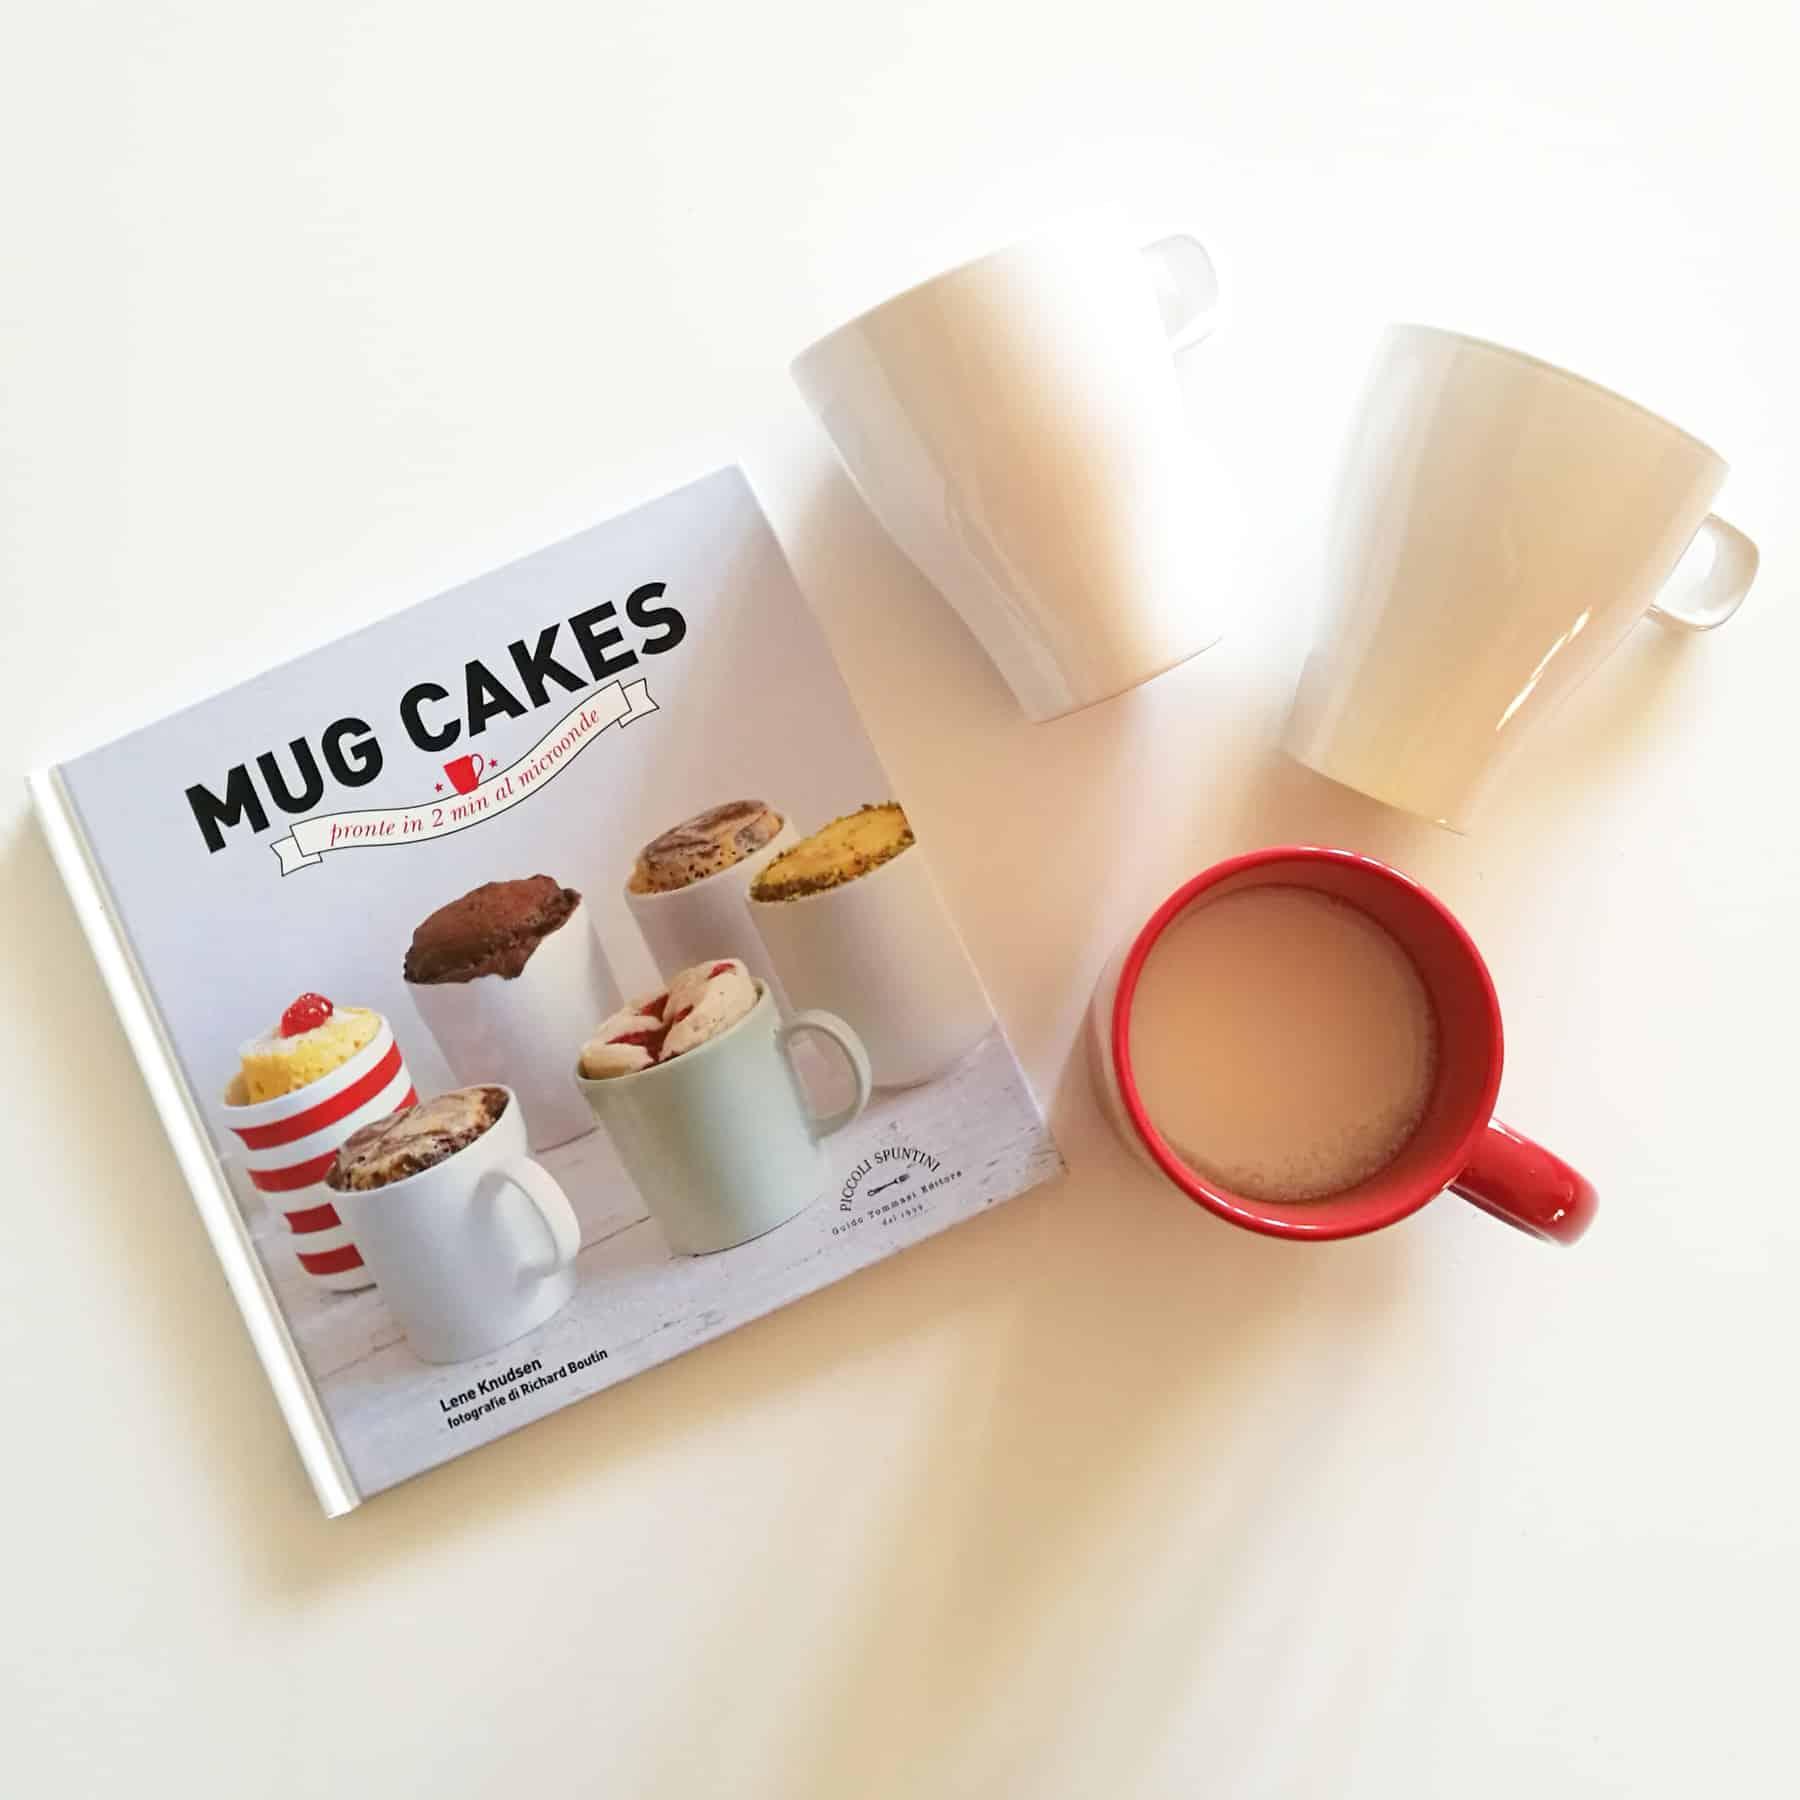 Mug Cakes – pronte in 2 minuti al Microonde